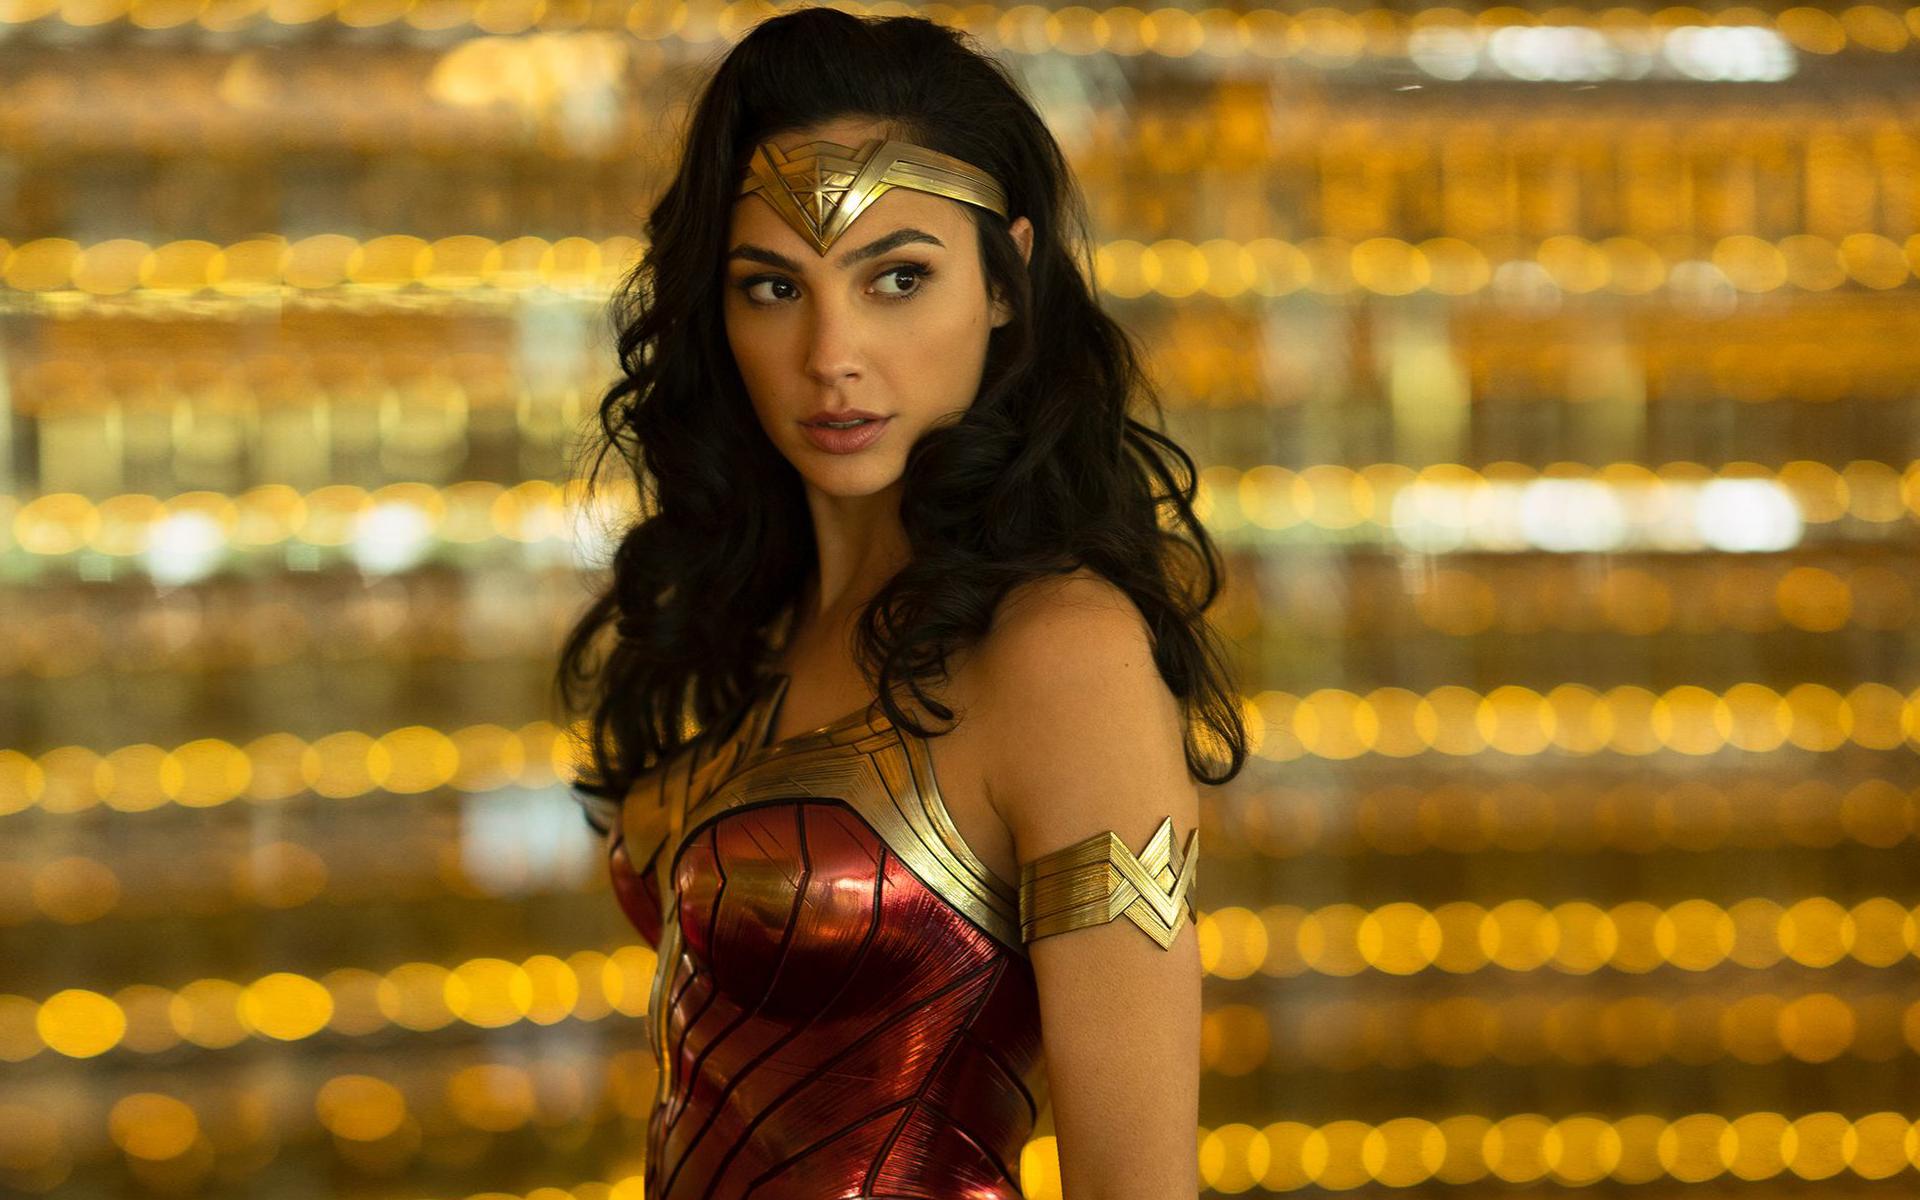 Wallpaper Gal Gadot Wonder Woman 2017 Movies Hd Movies: Wonder Woman 1984 HD Wallpaper